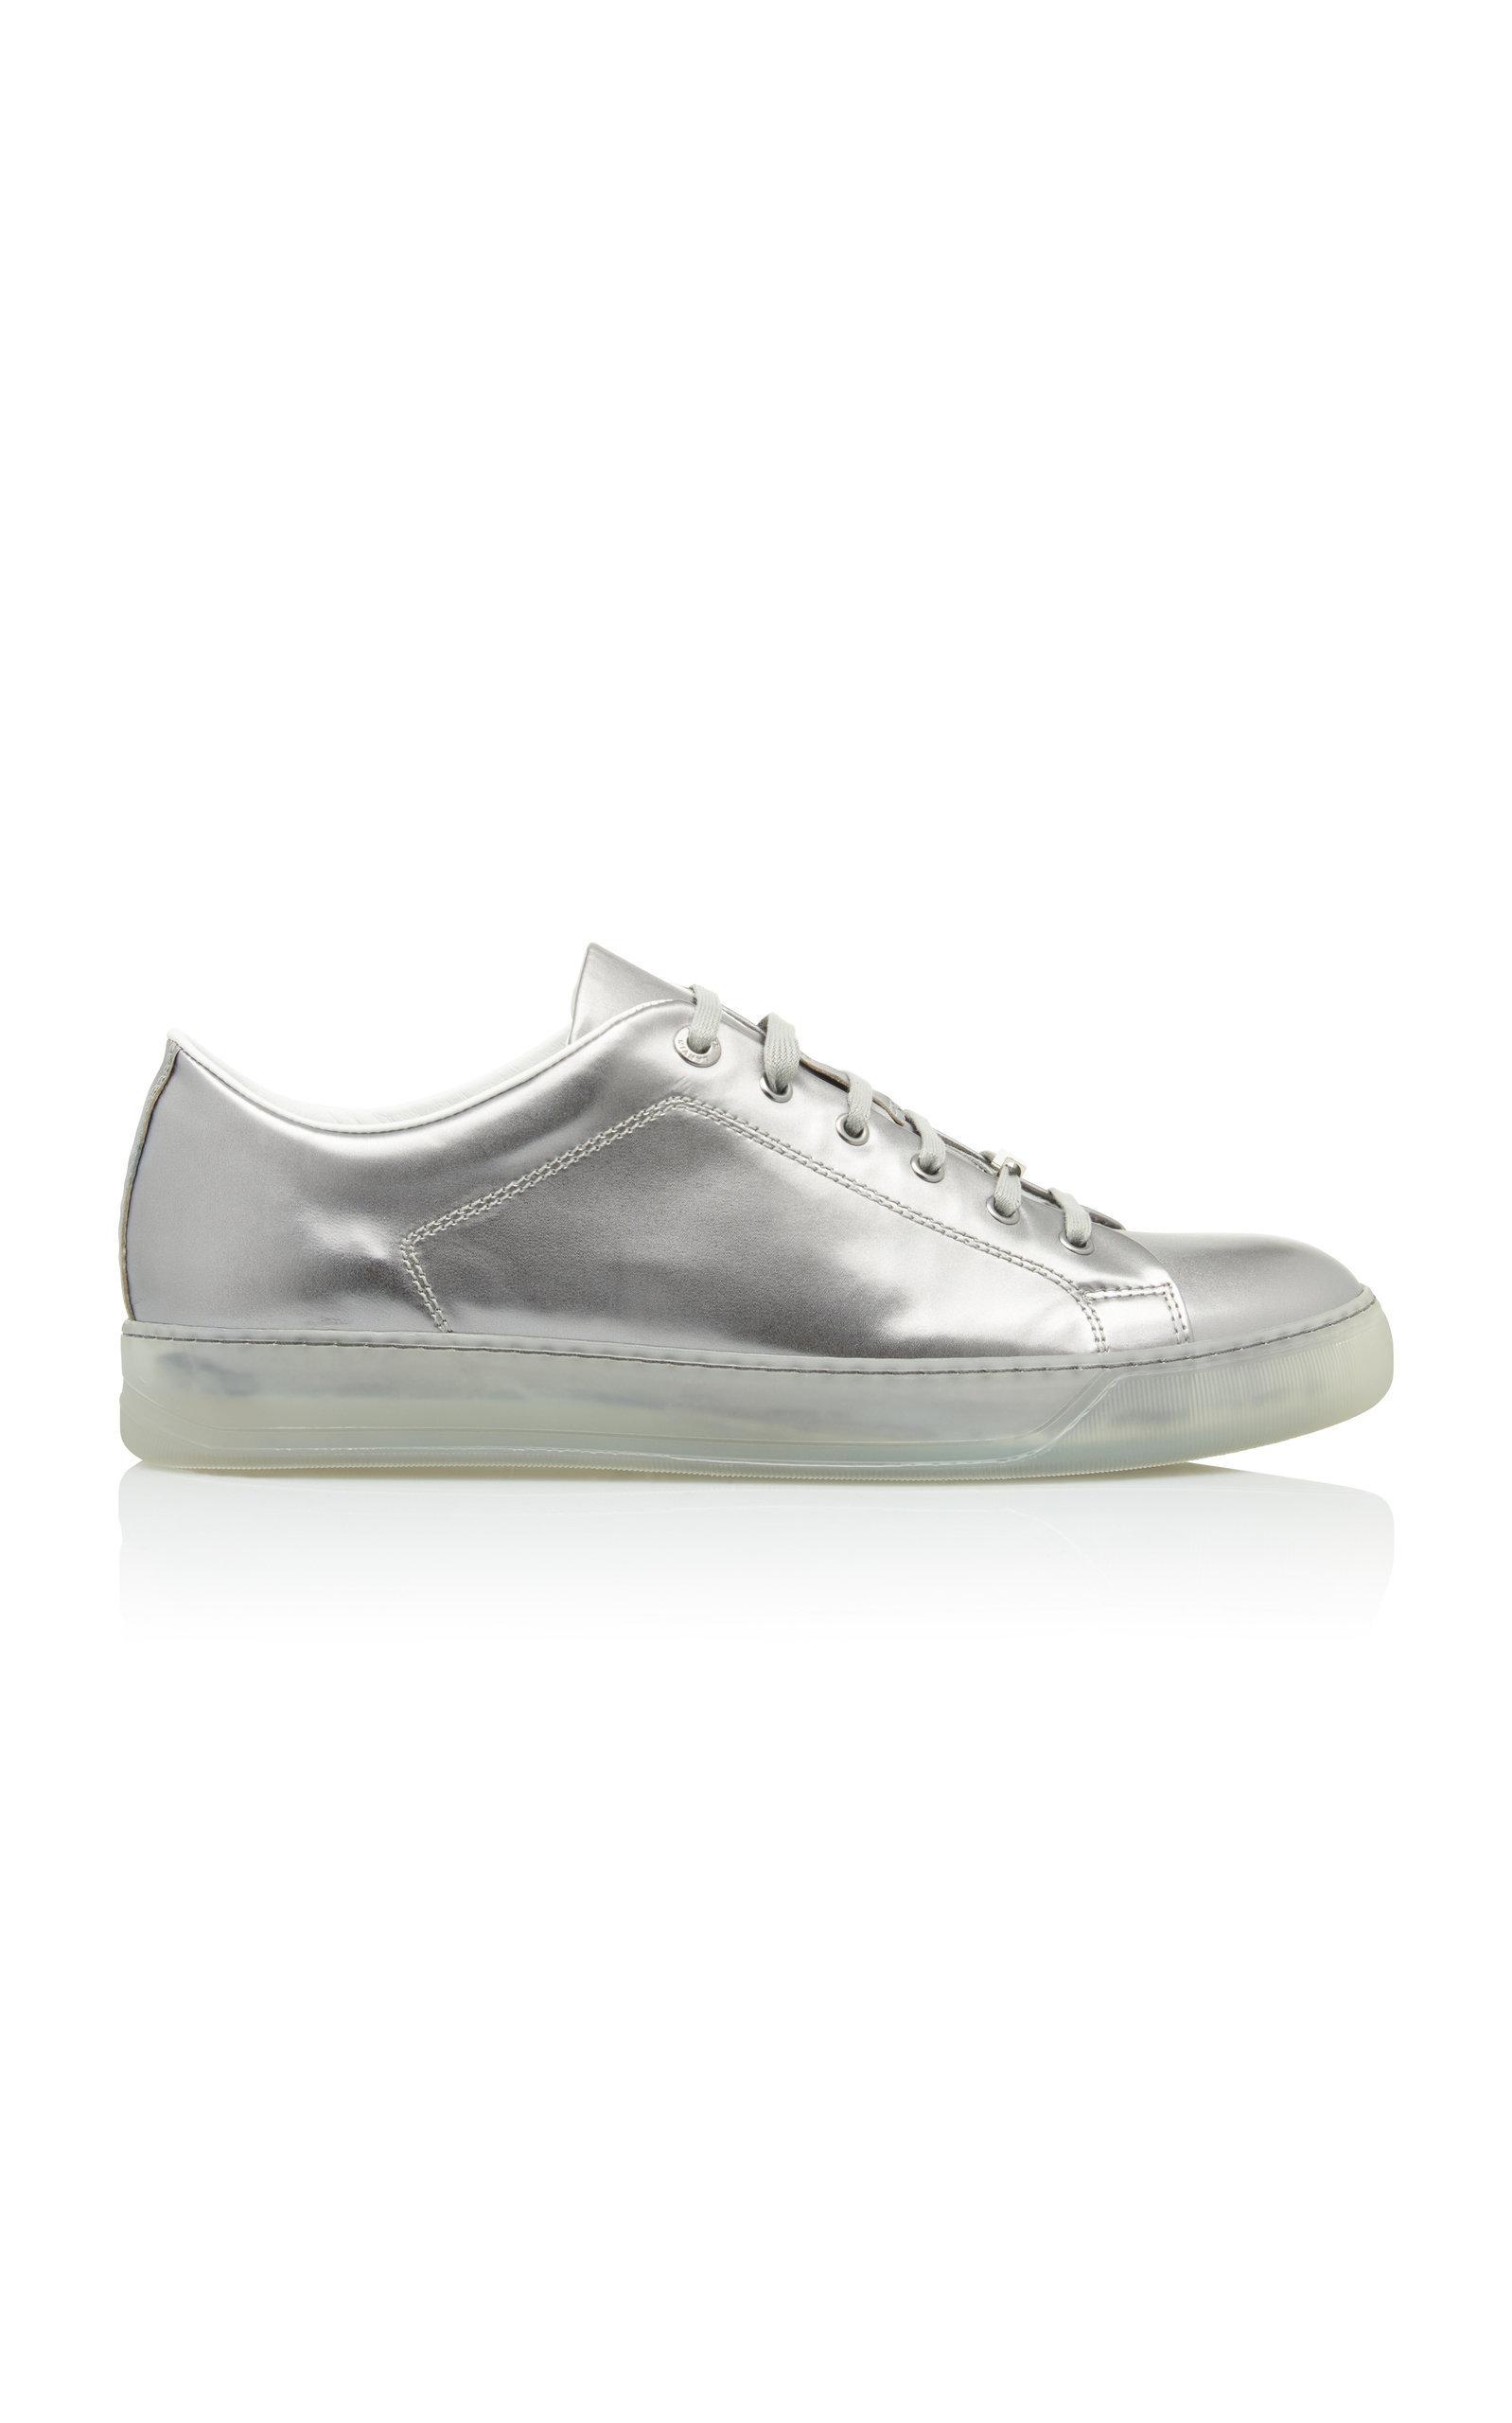 Mens designer shoes, Metallic leather